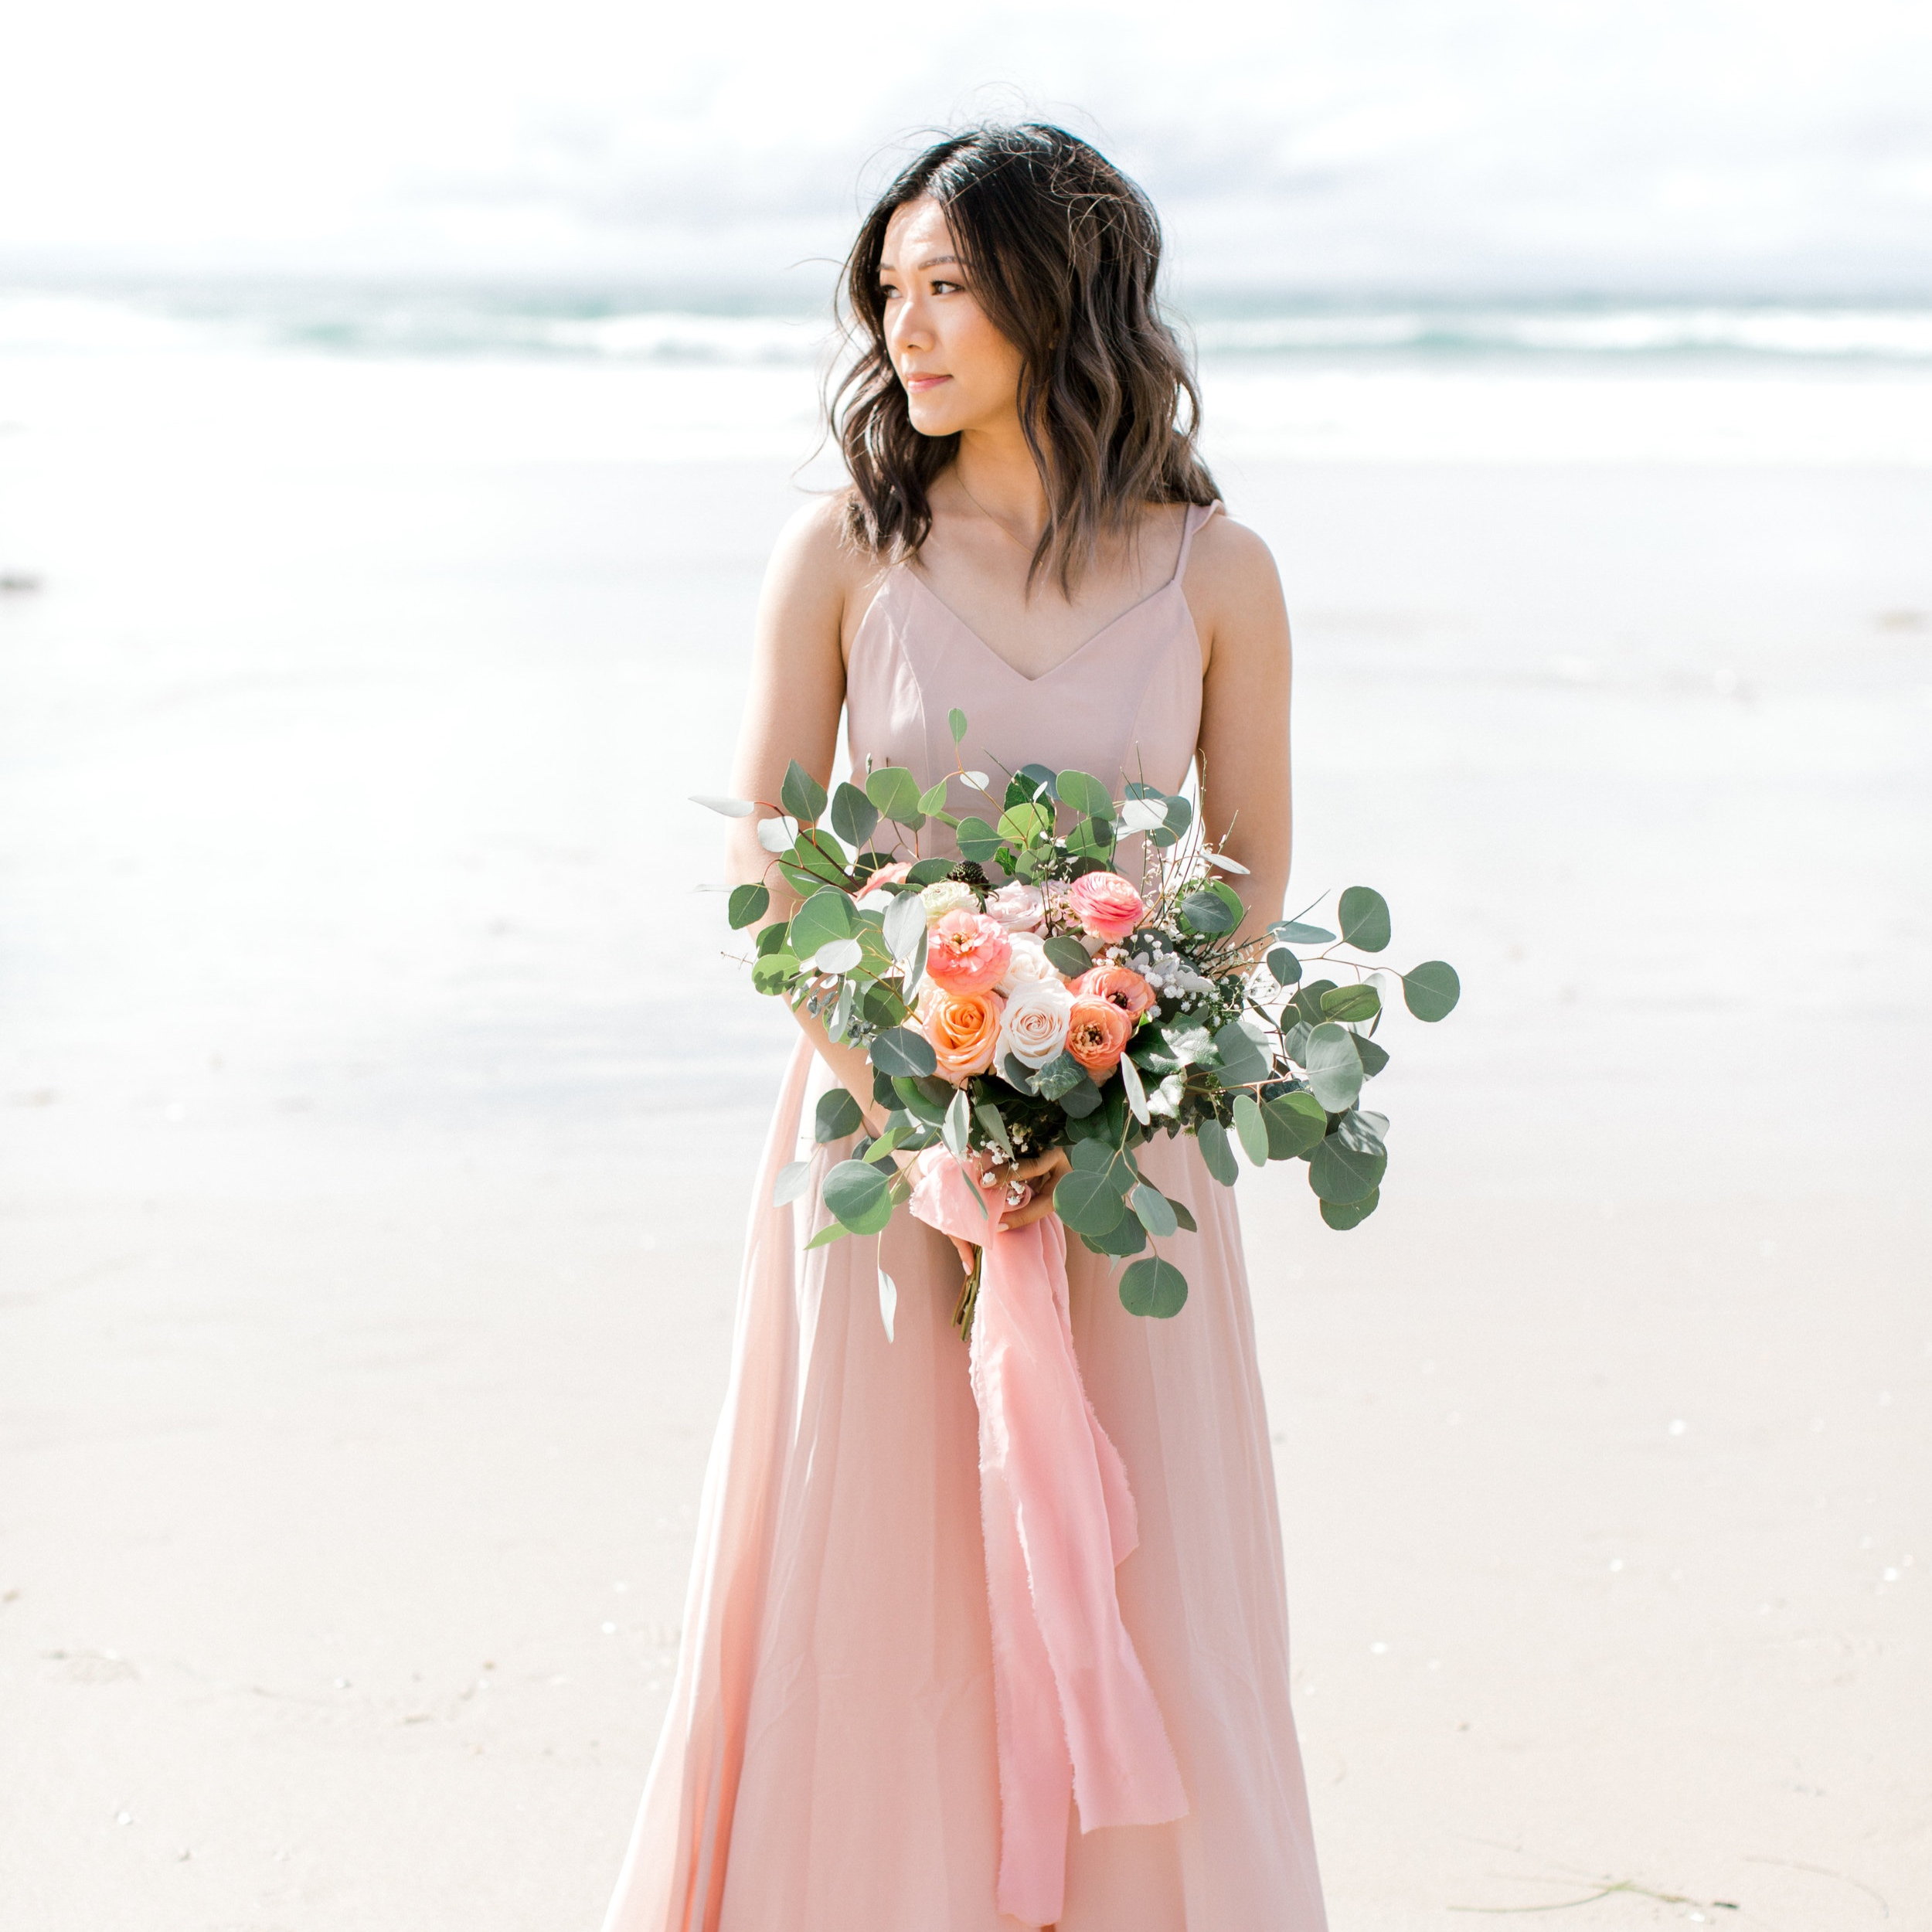 Kathleen - Floral Design - Ashley Hur - Hip Hip Hooray Dot Love